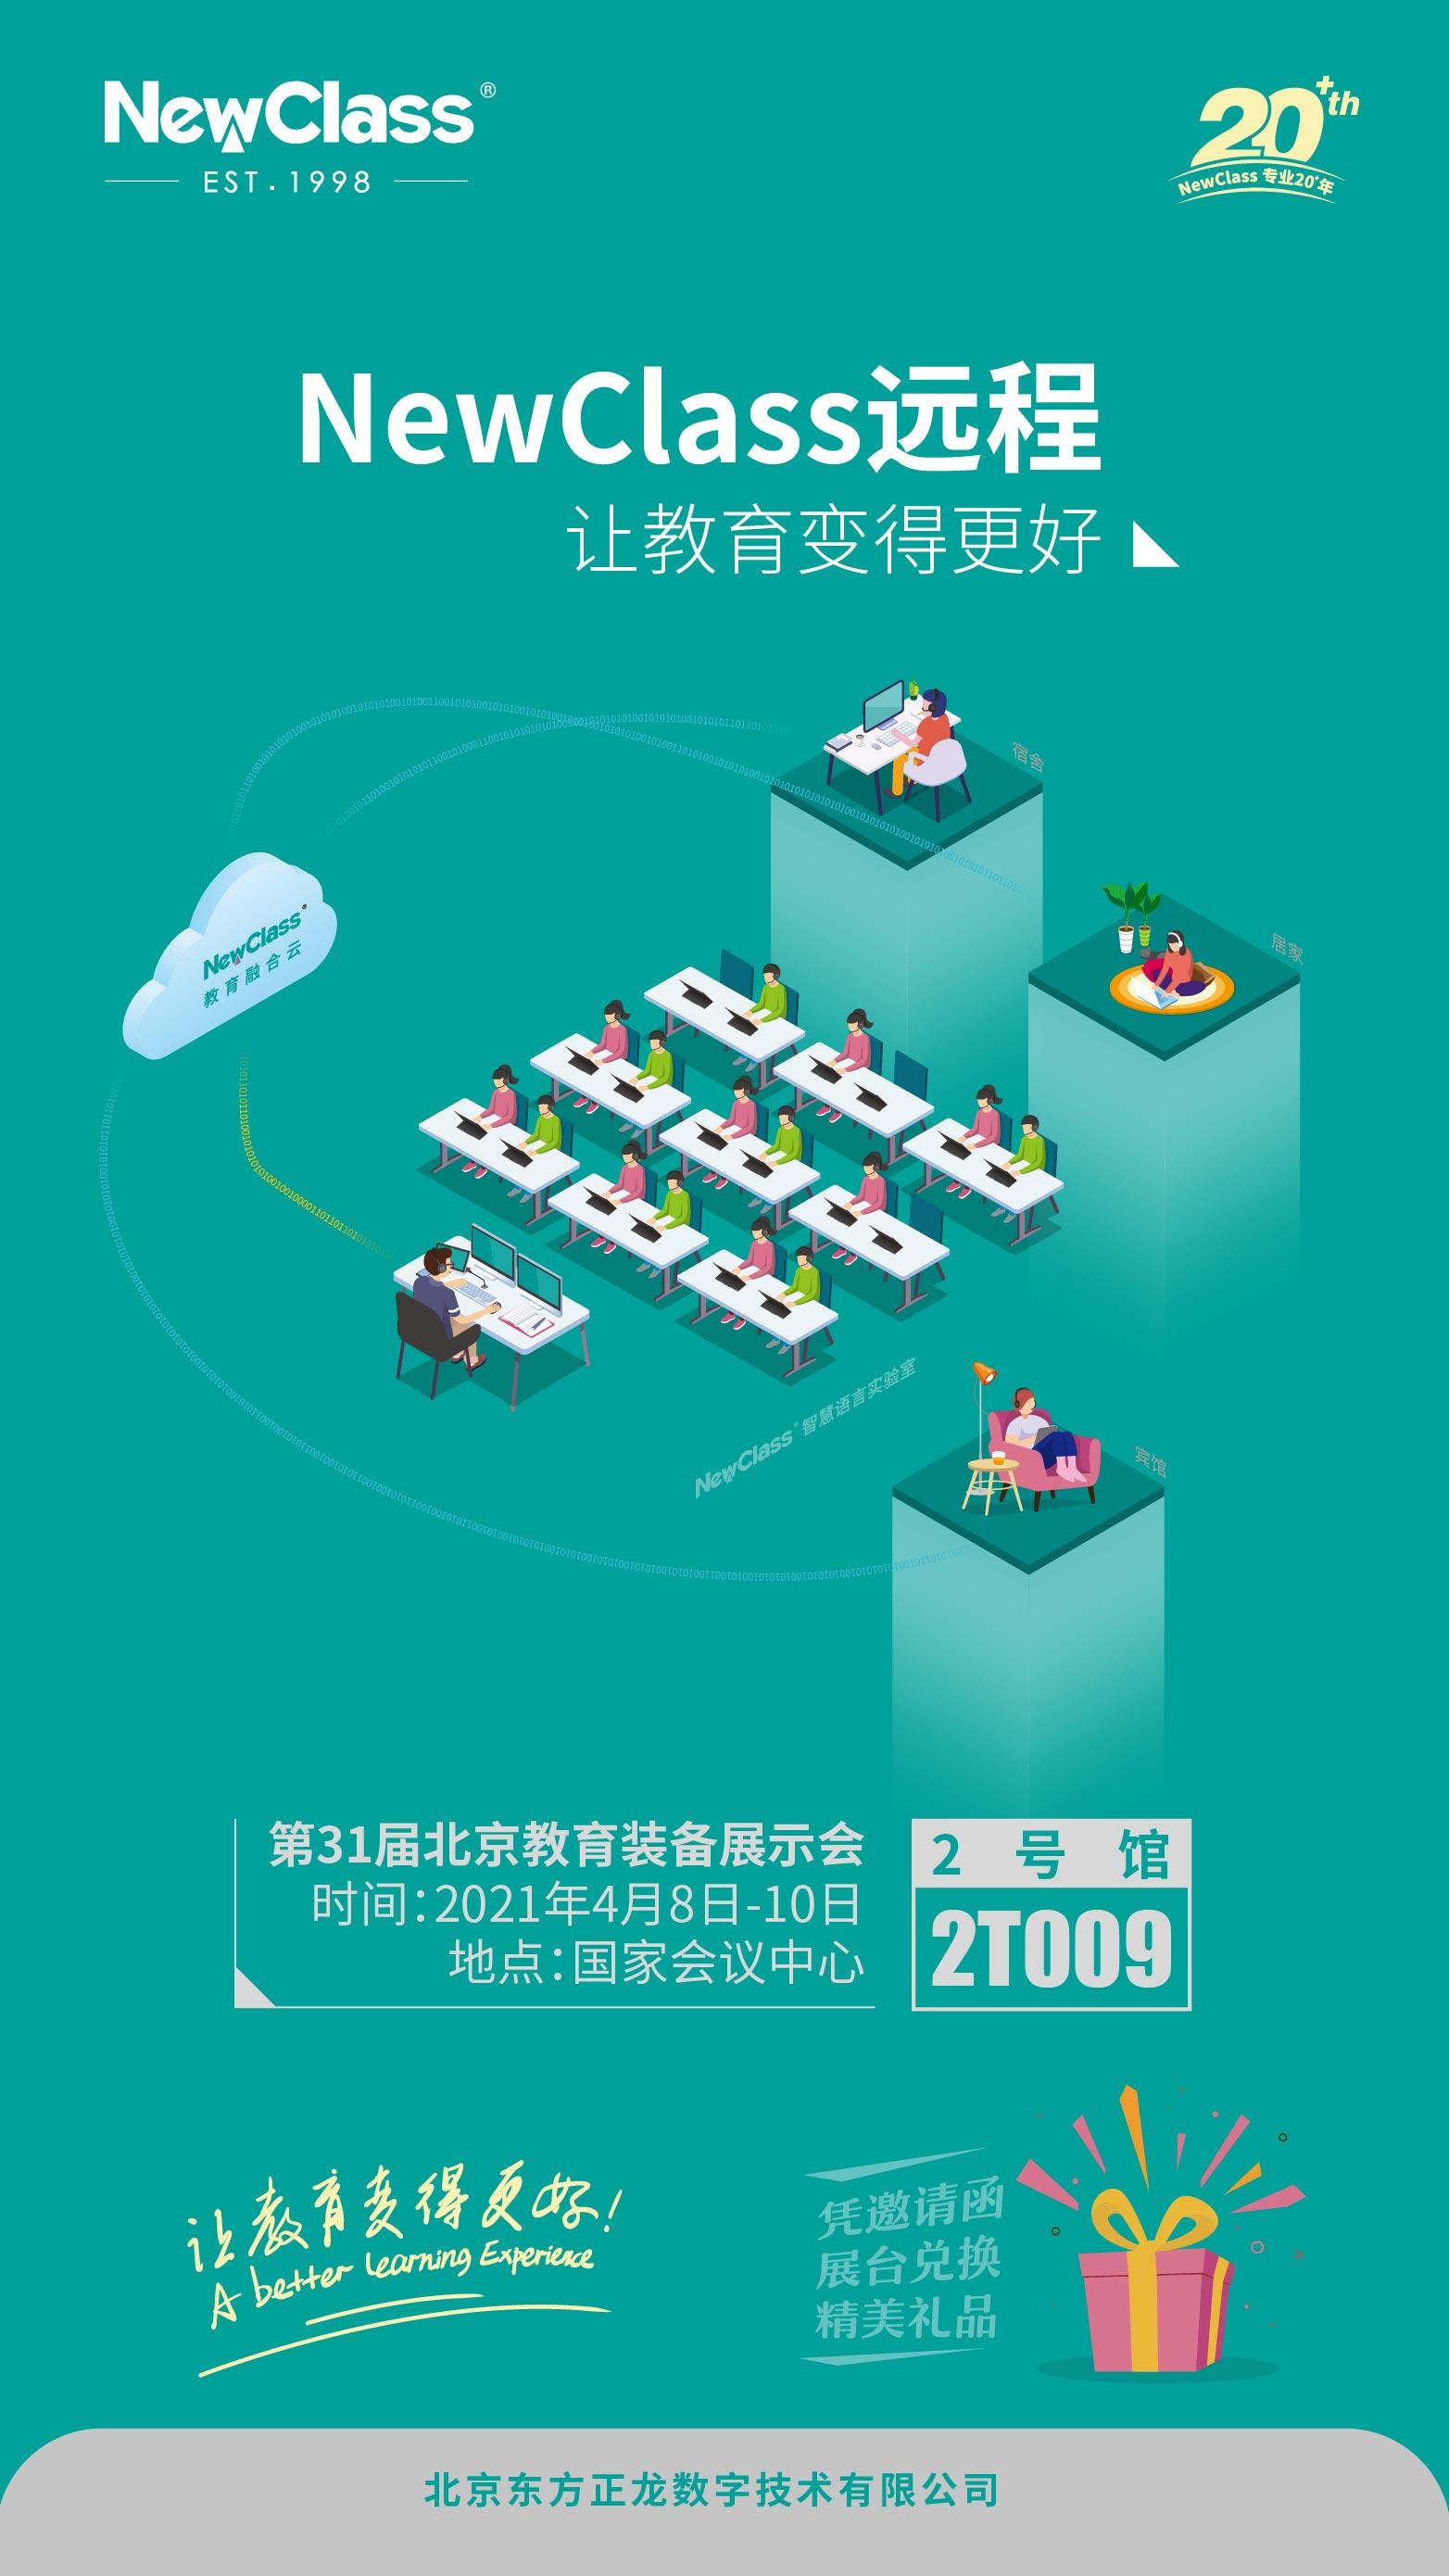 NewClass远程,首秀北京教装展